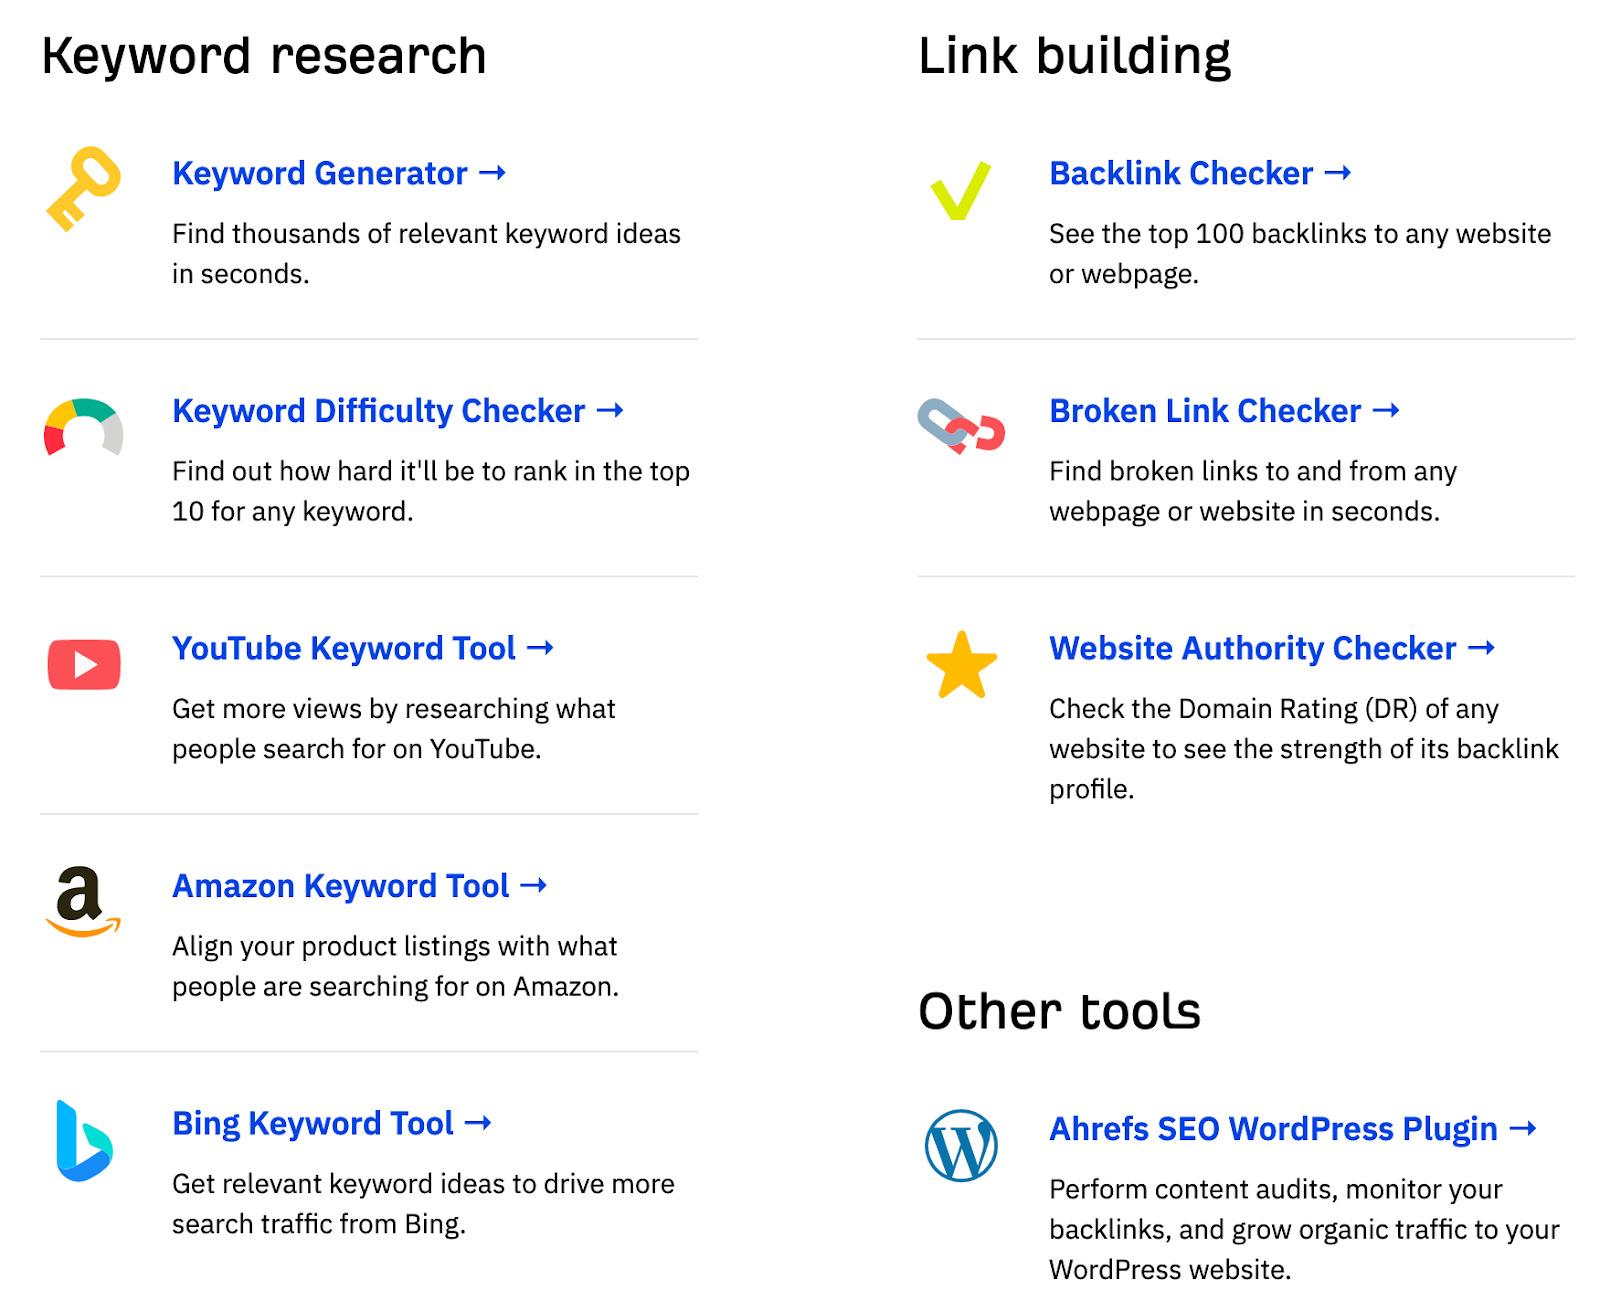 11 ahrefs free seo tools